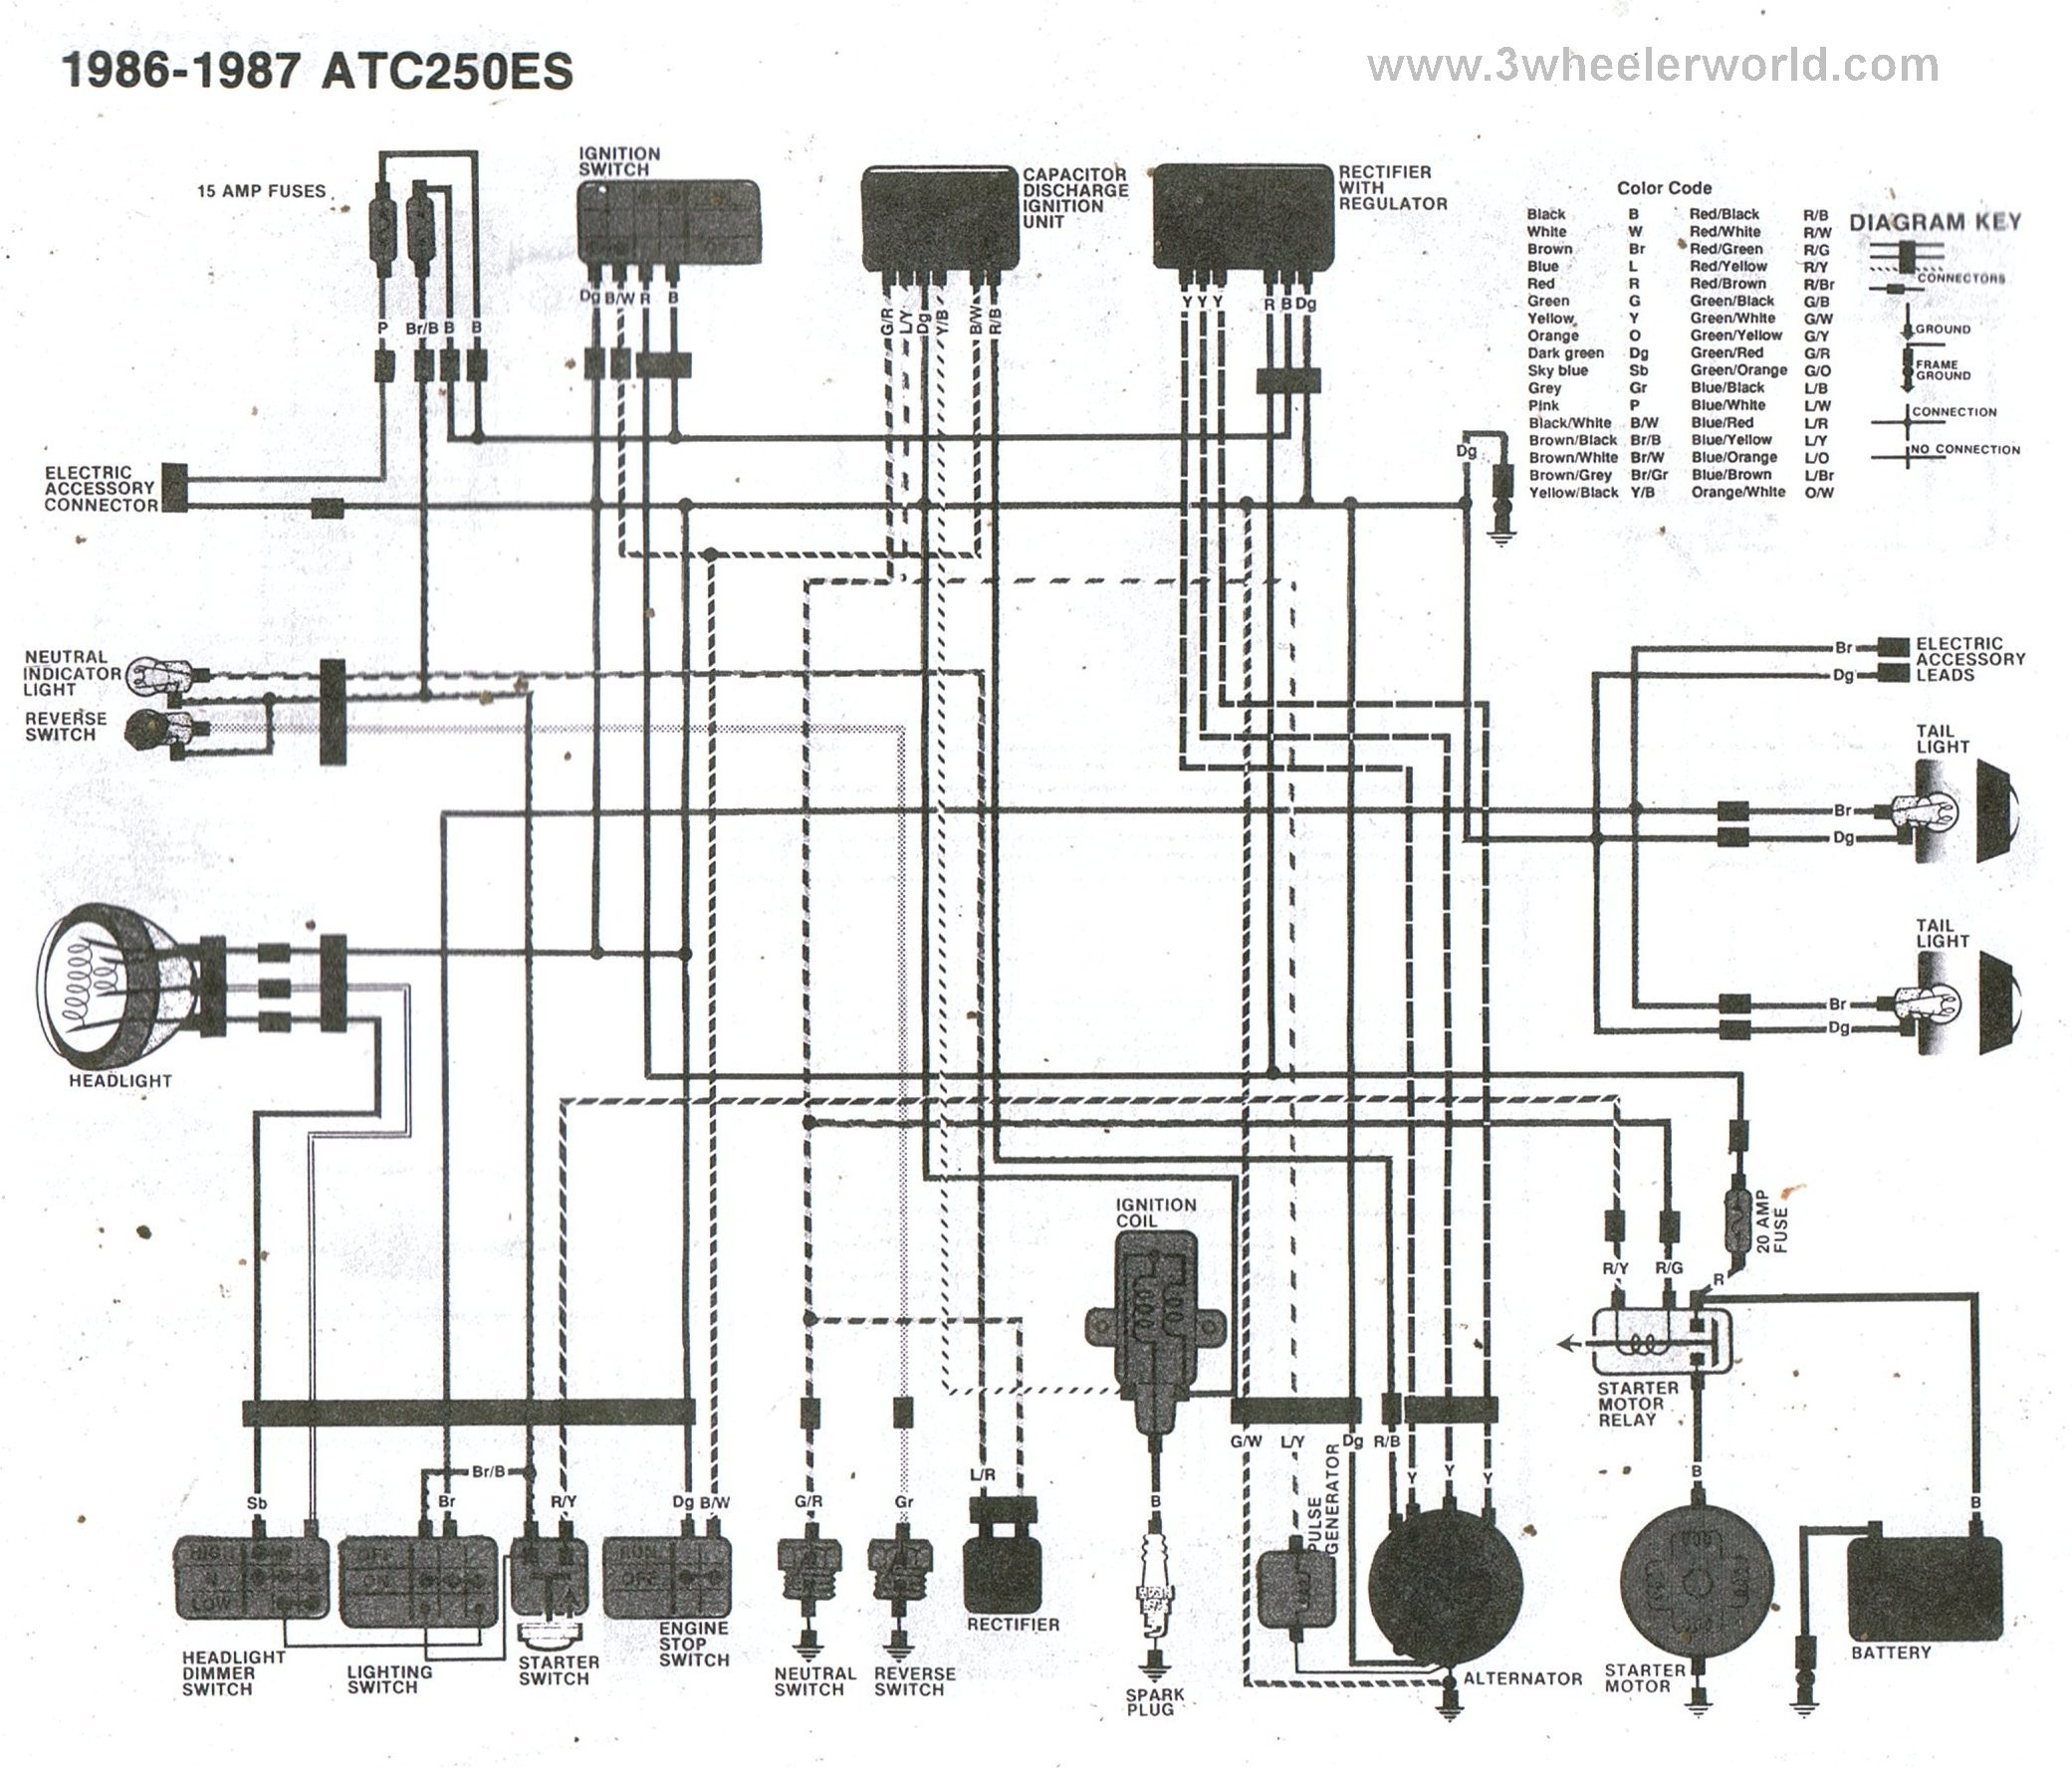 Trx400ex Wiring Diagram